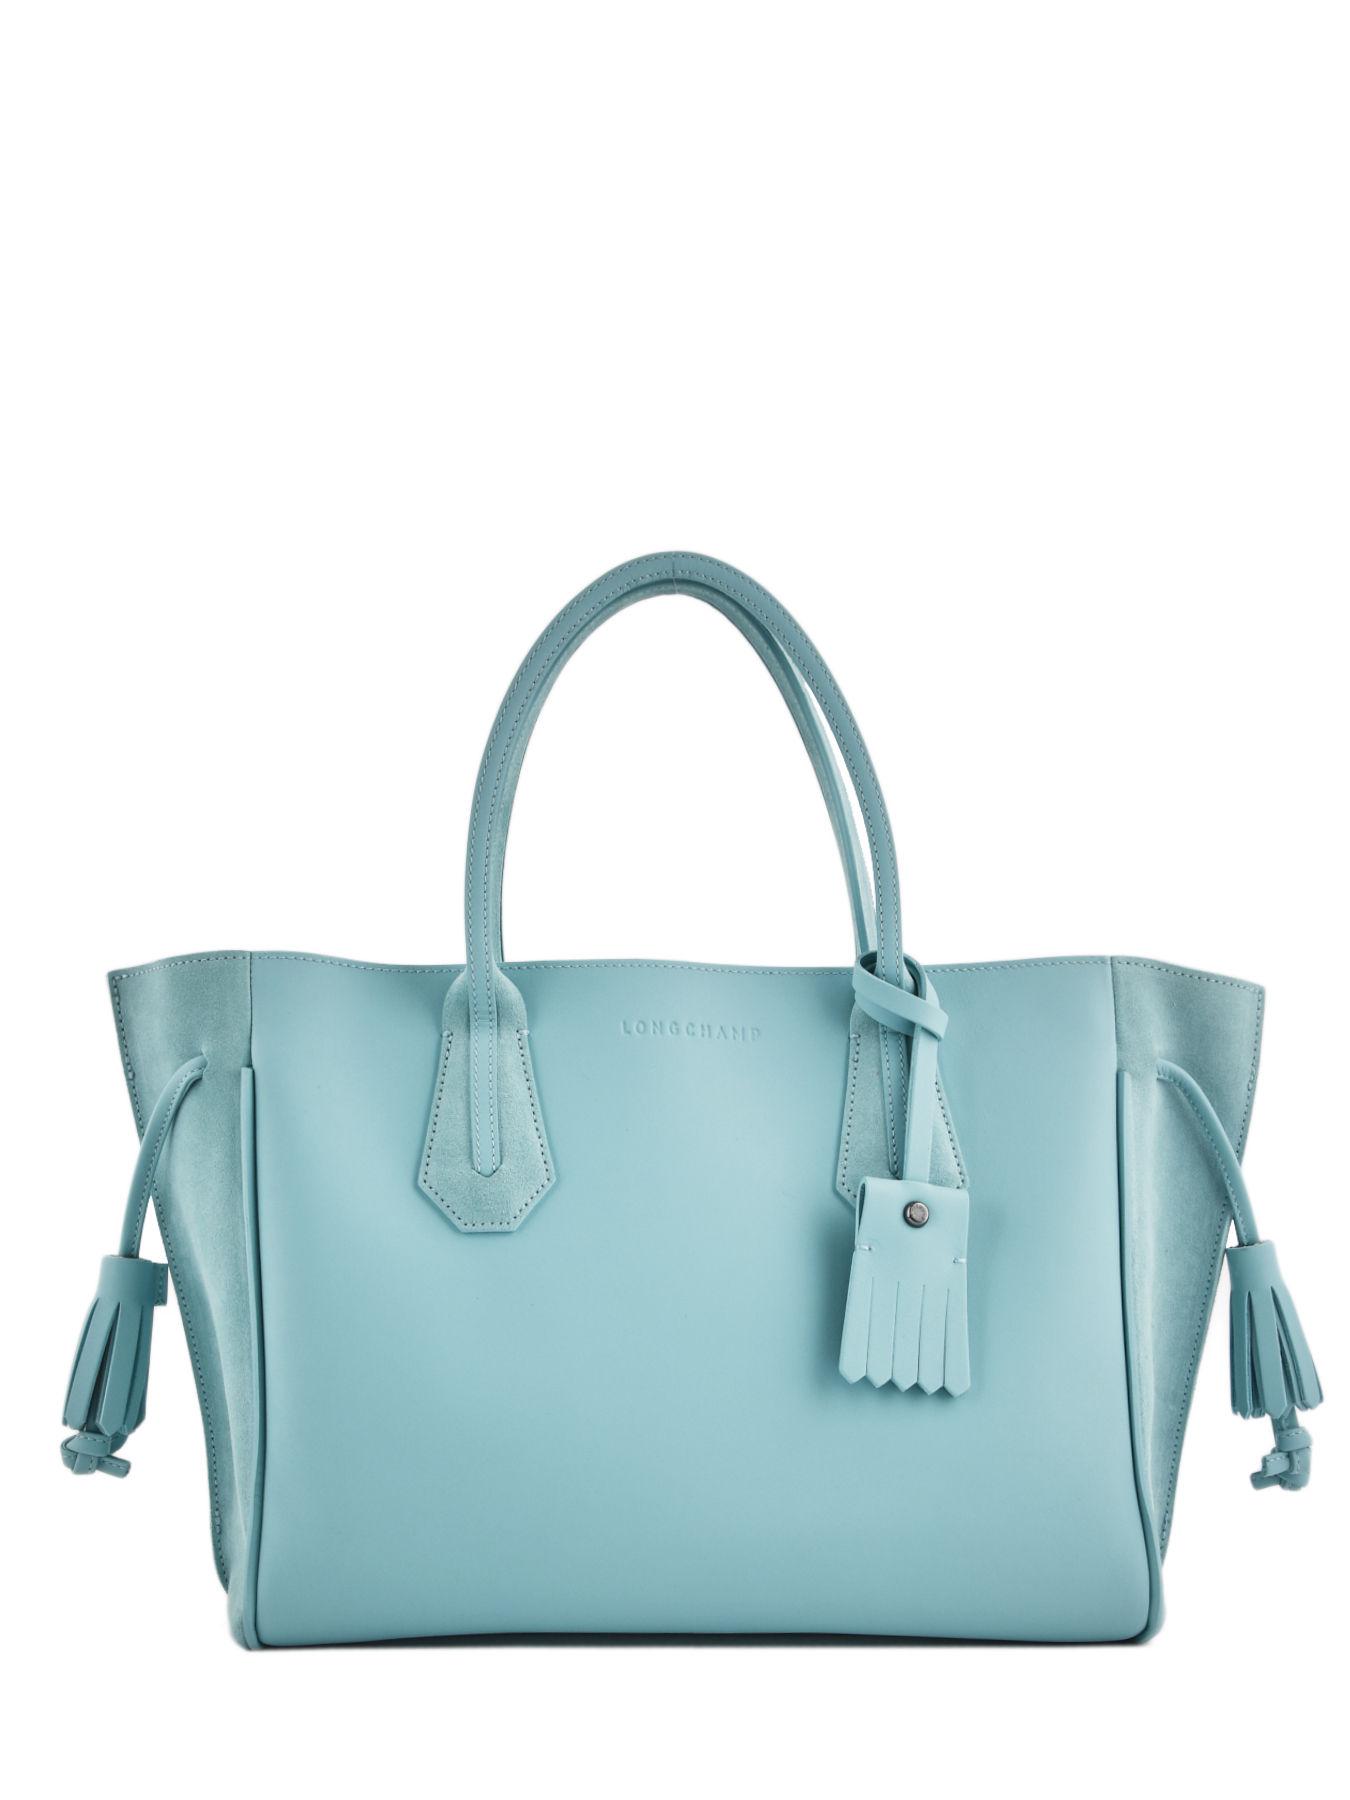 Longchamp Handbag 1295861 - free shipping available 7d456269a1